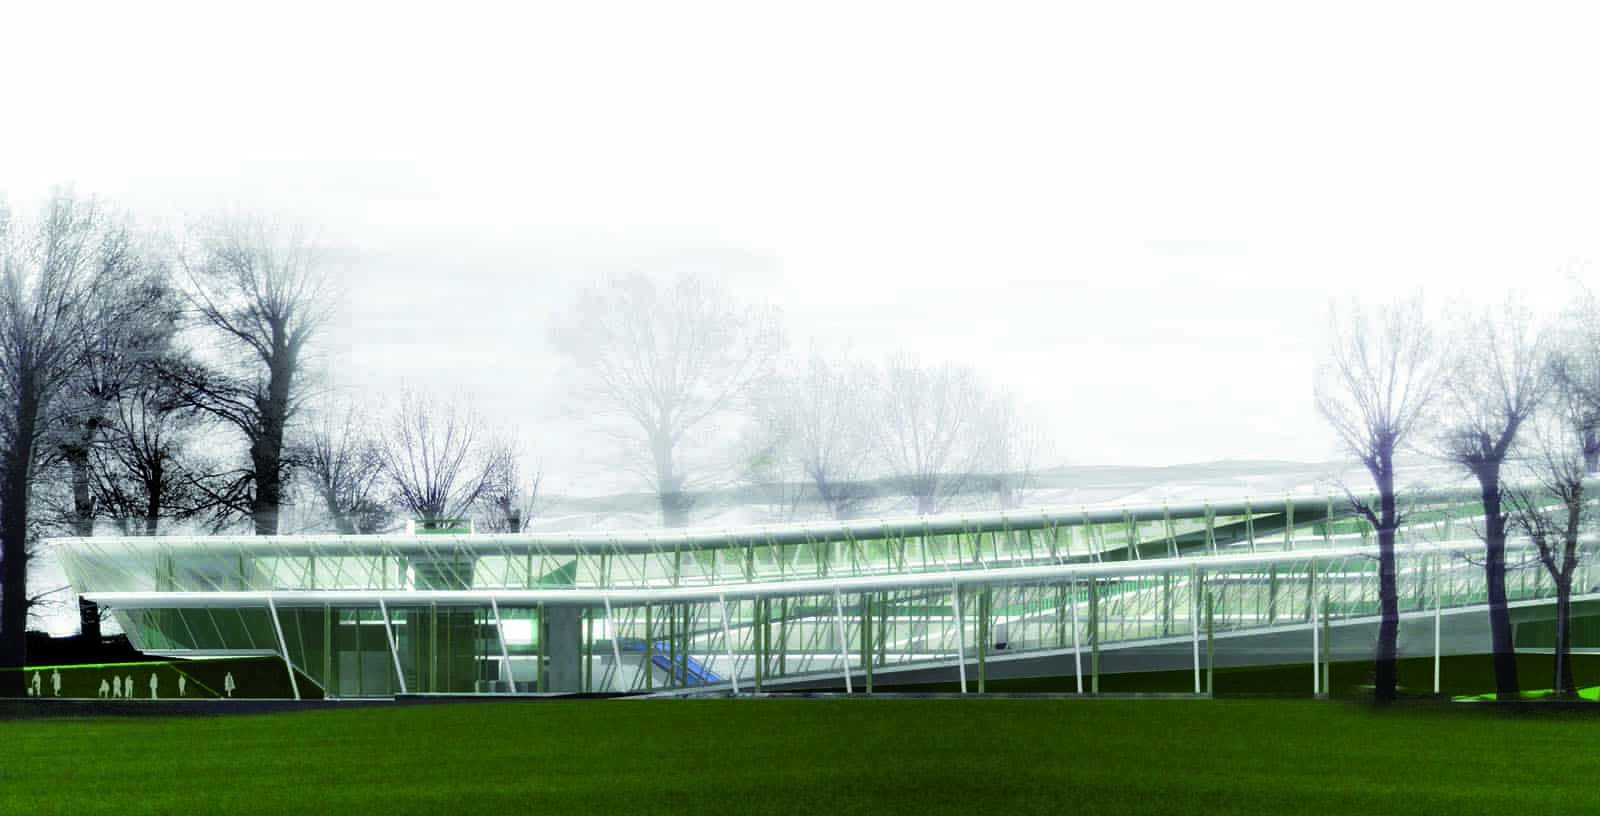 High_Speed_Station_Poland_03_Architecture_IDOM_computer_graphics_Ismael_Vega_Andreia_Faley